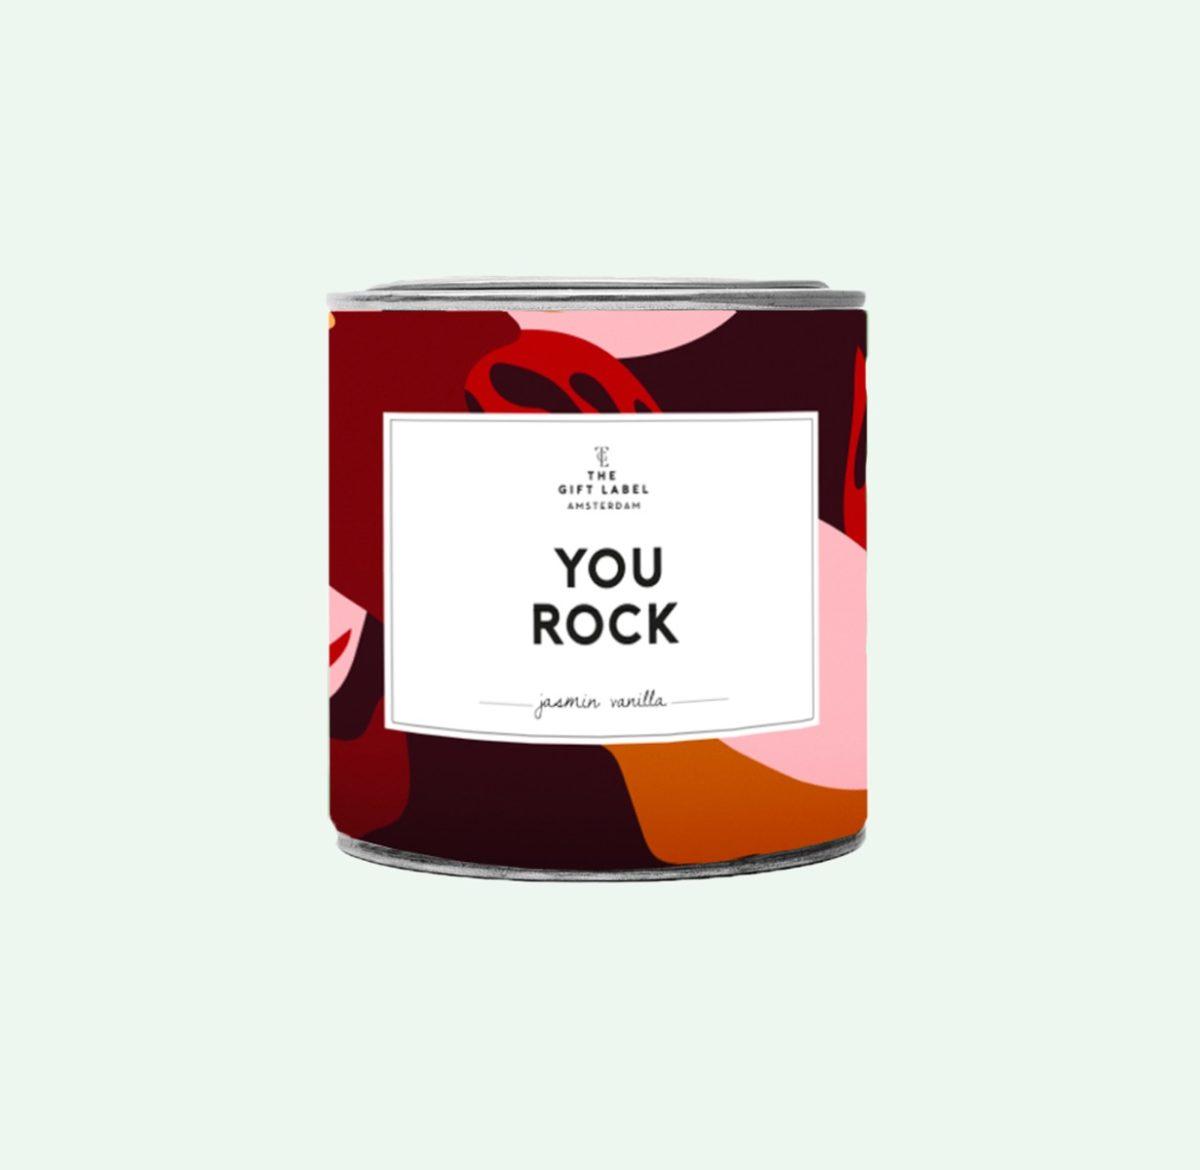 GiftLabel geurkaars in blik groot merci - Stylin cadeau artikelen Rijnsburg